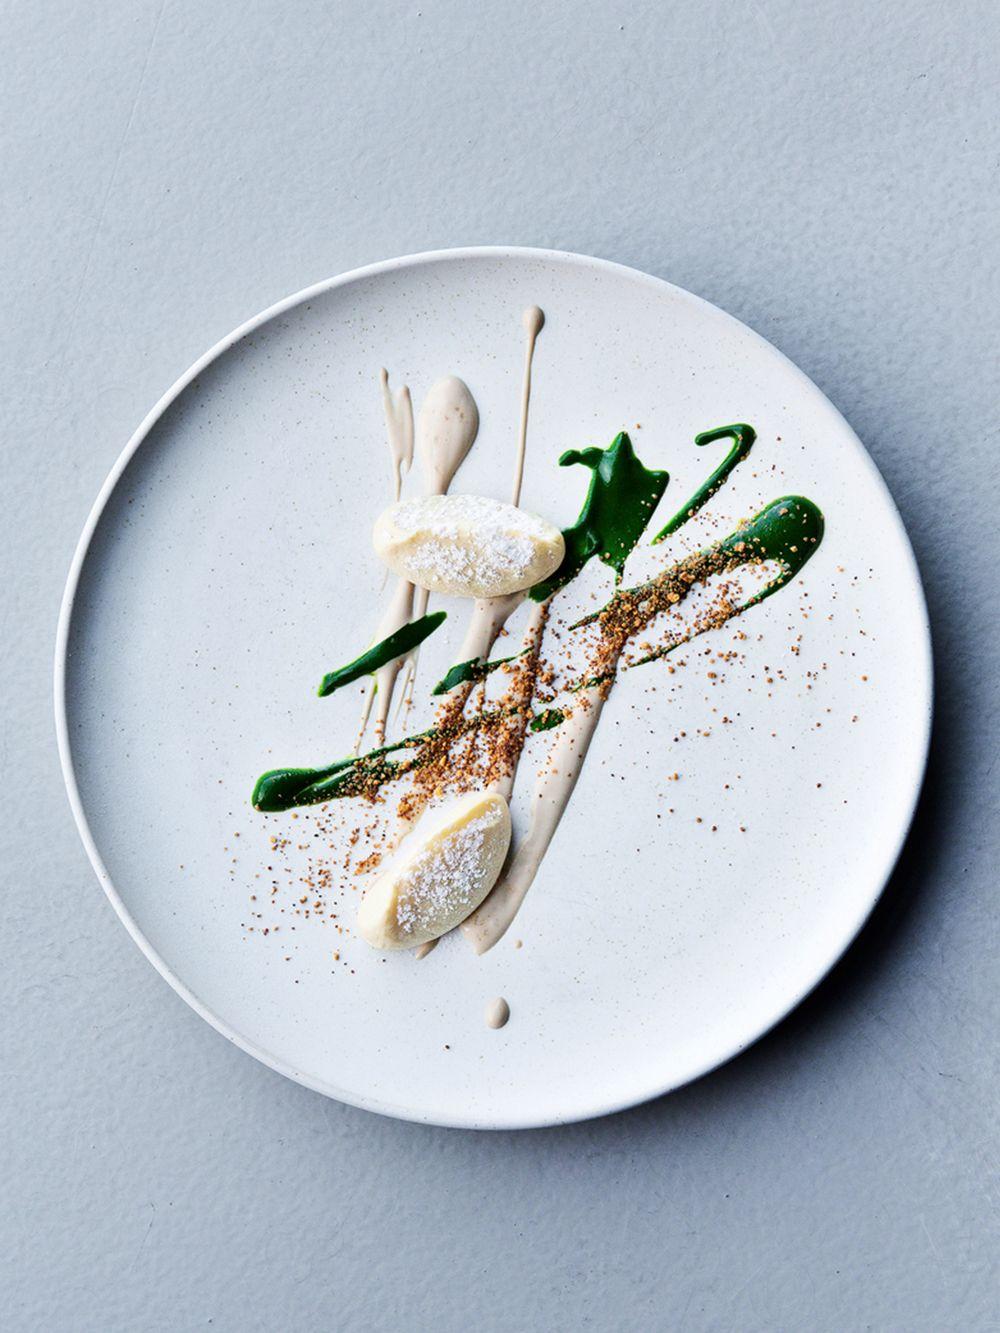 Dried potato, almond, and parsley by chef Matt Orlando of Amass ...